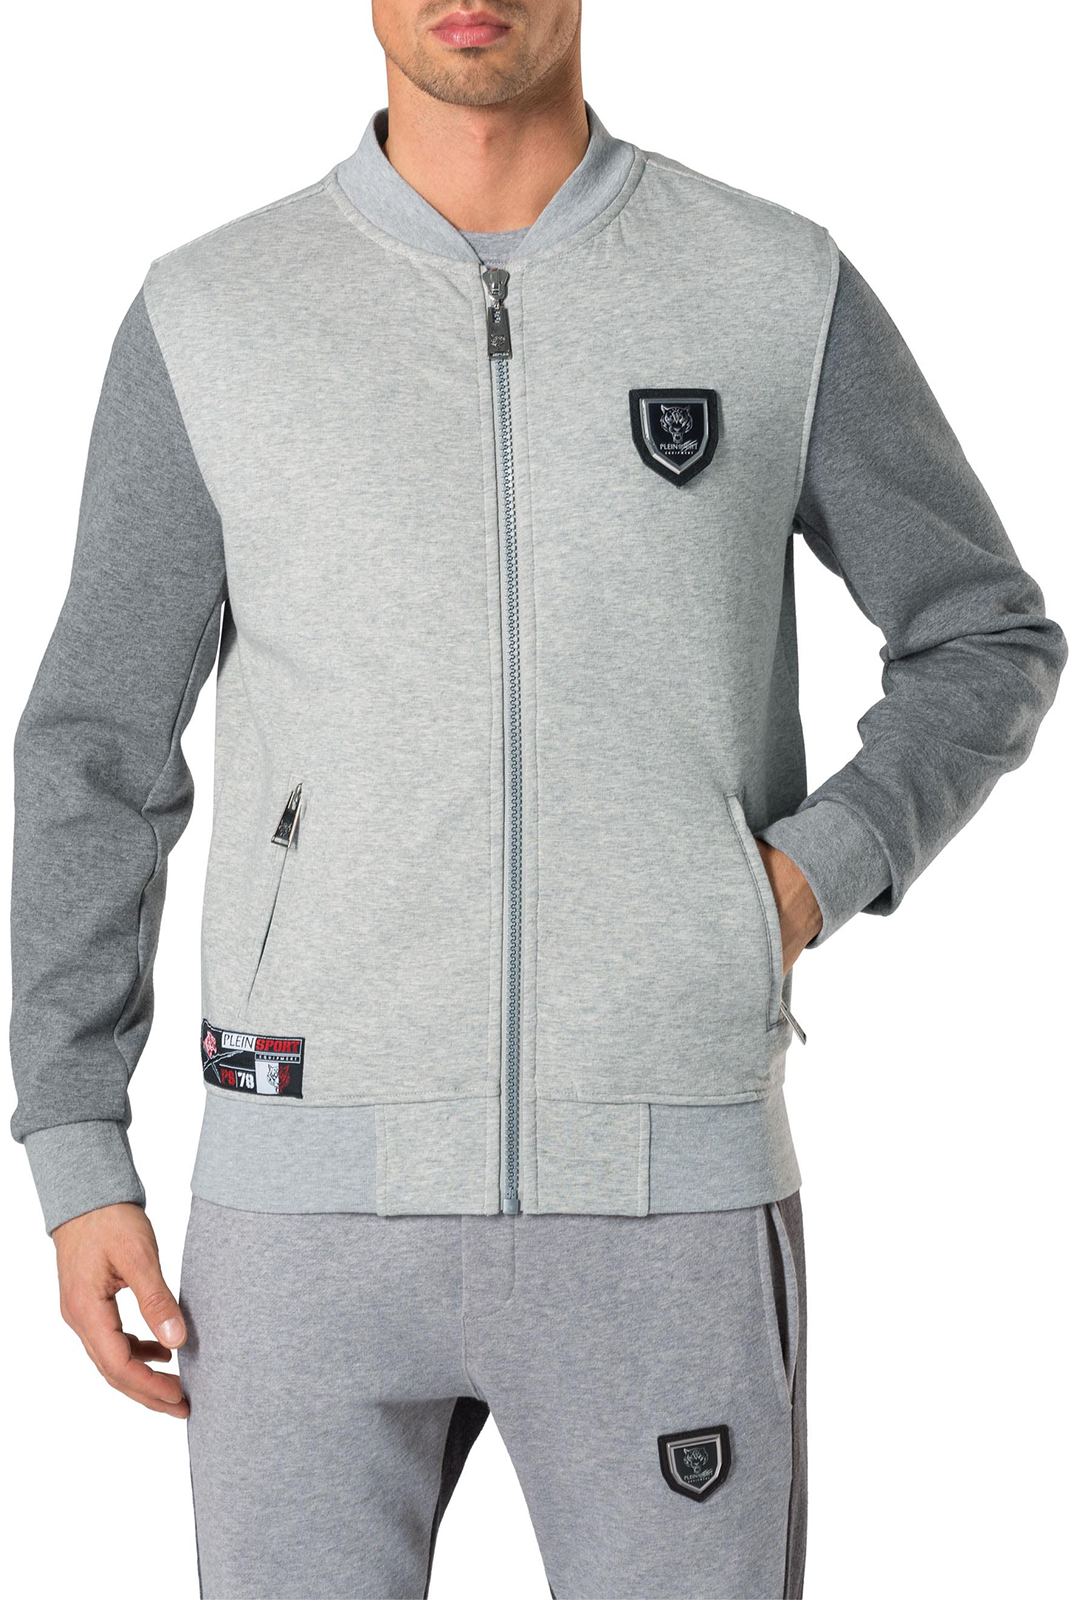 Vestes zippées  Plein Sport P17C MJB0070 S005 CHARCOAL GREY